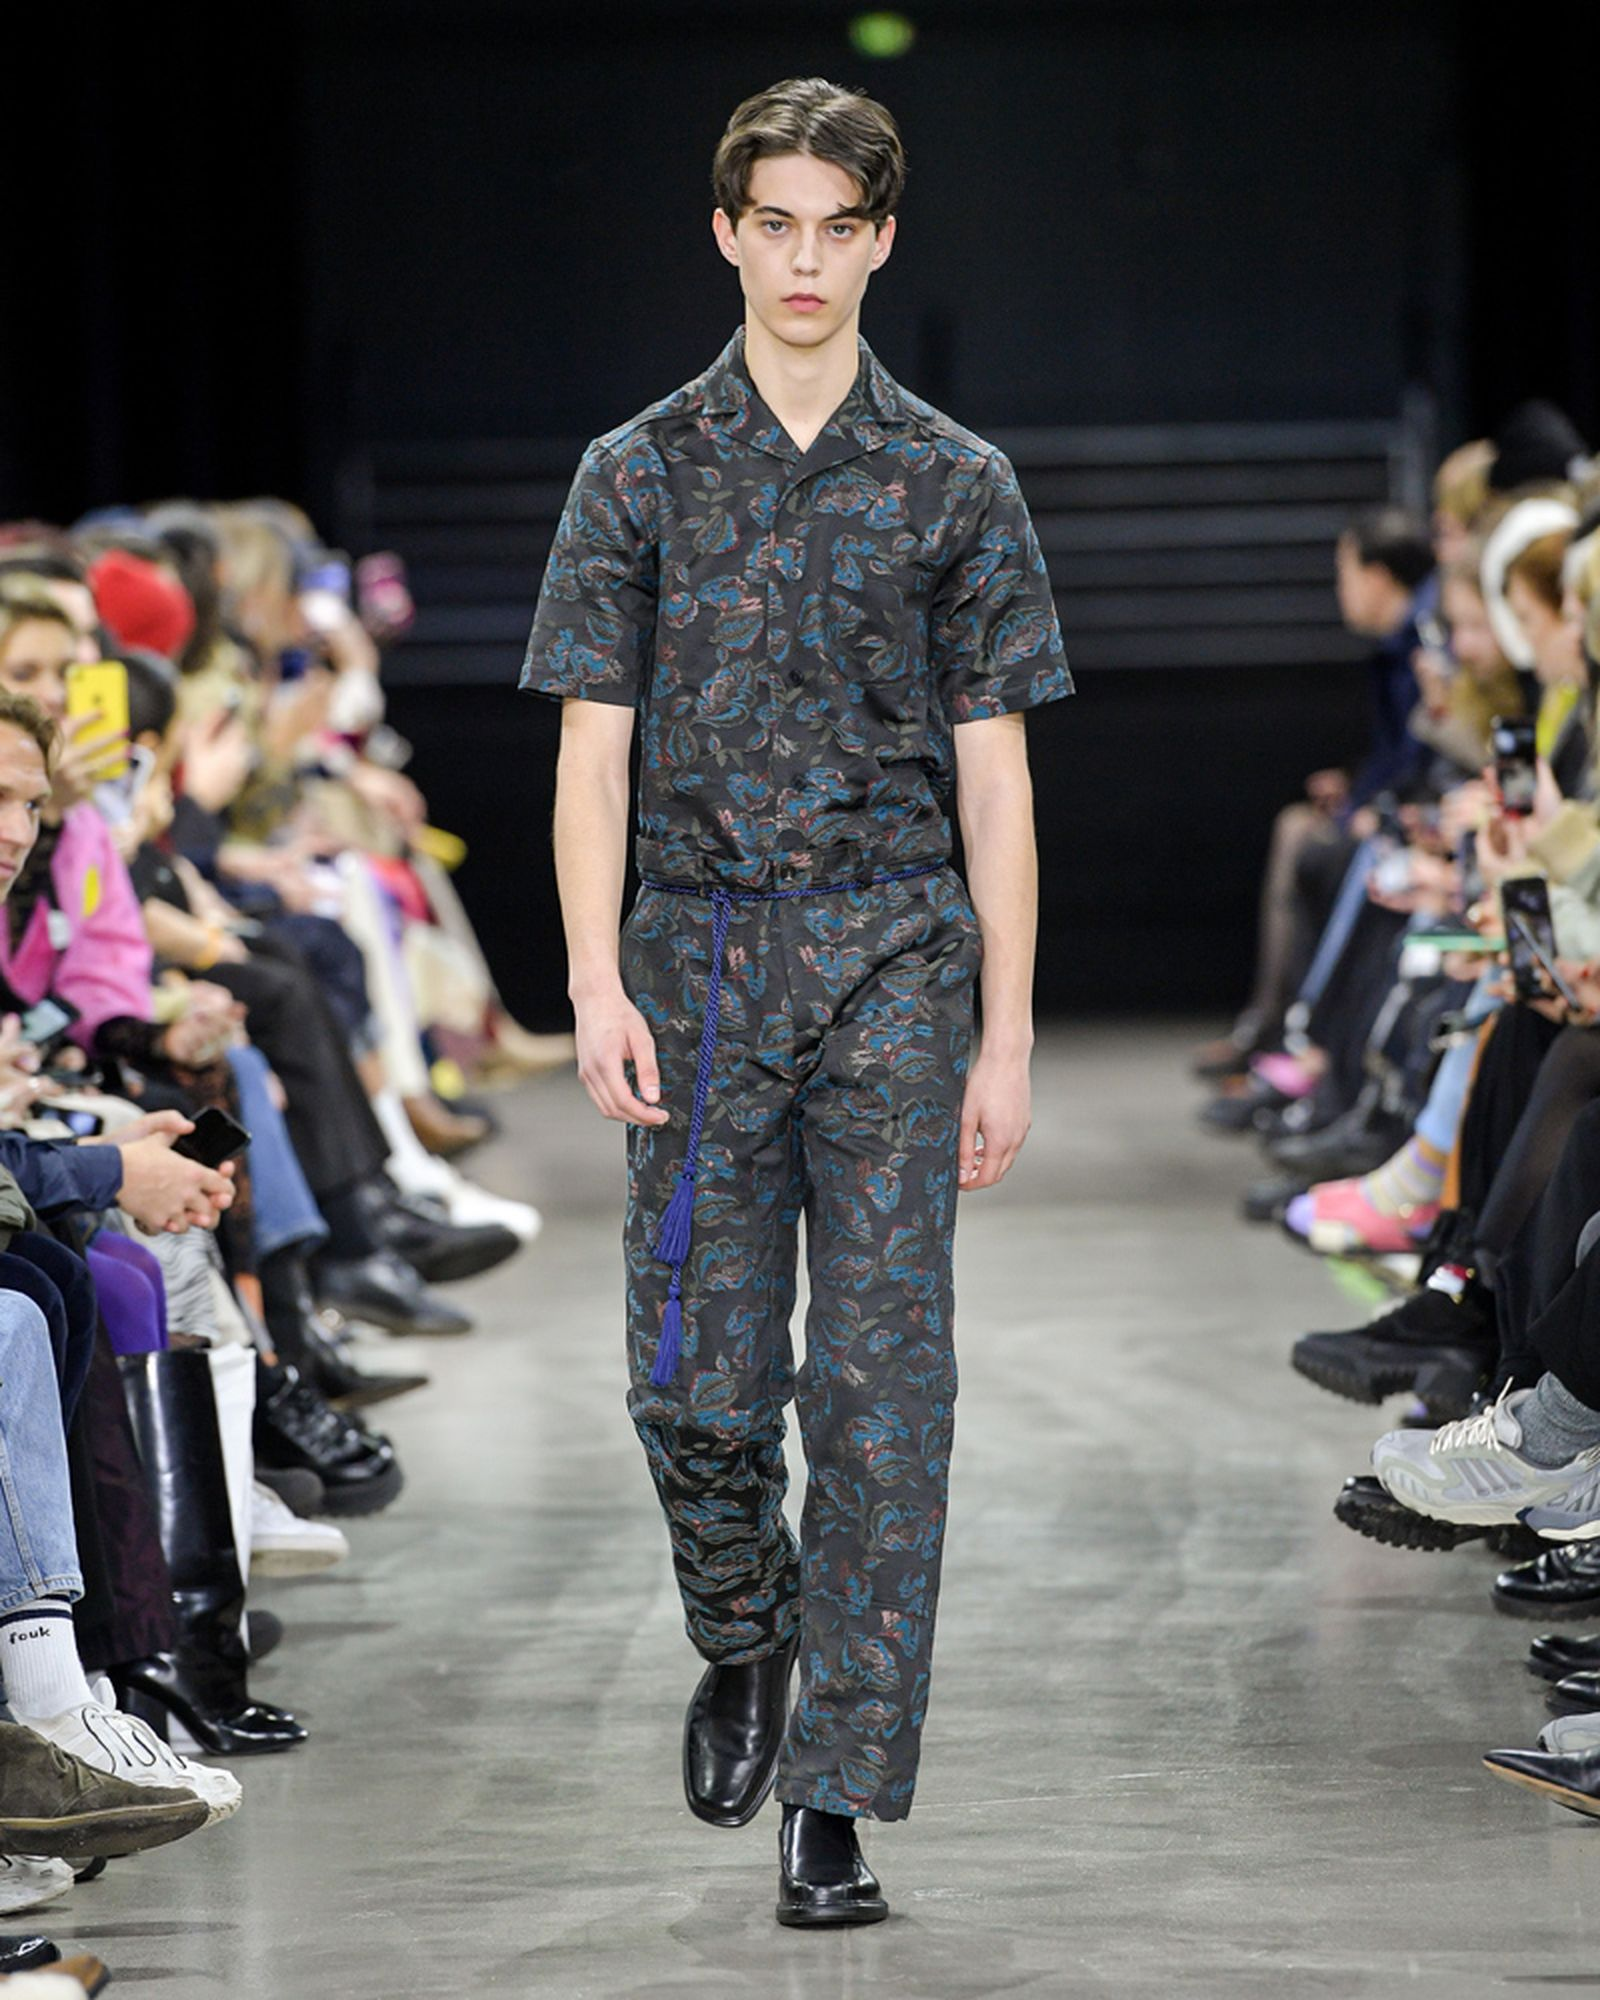 future-fashion-week-copenhagen-soulland-4